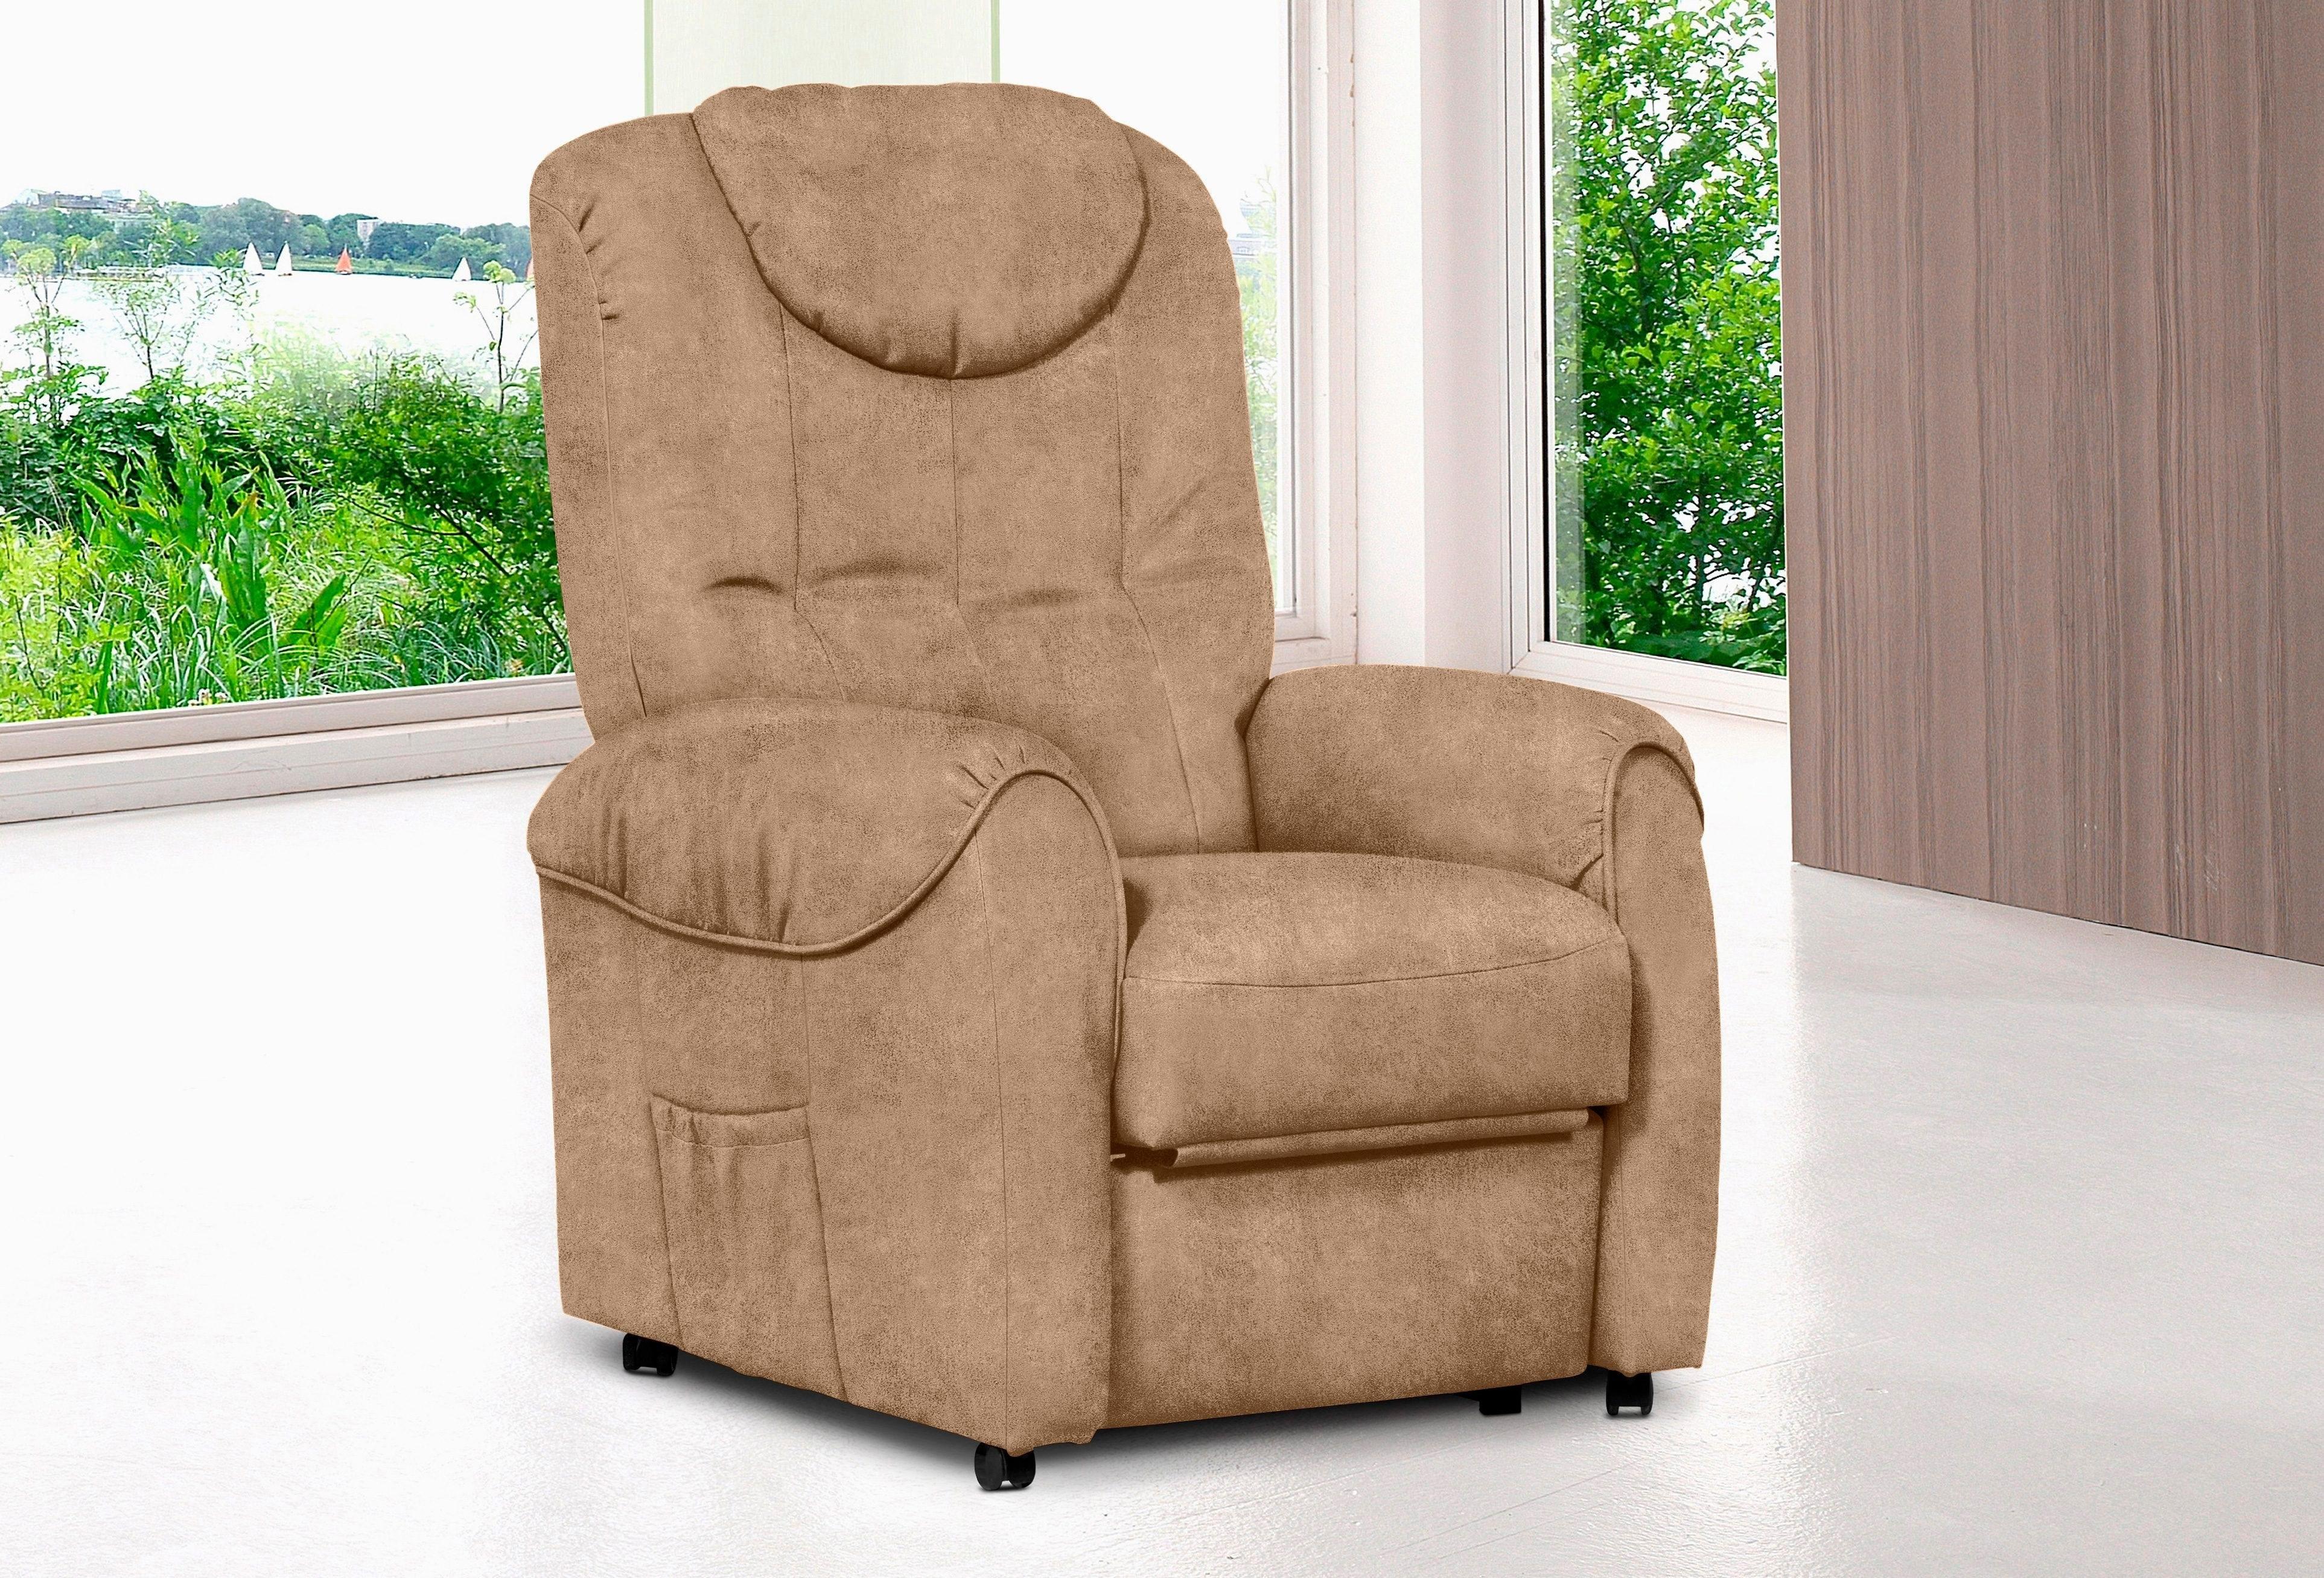 Sit&more TV-fauteuil - gratis ruilen op otto.nl